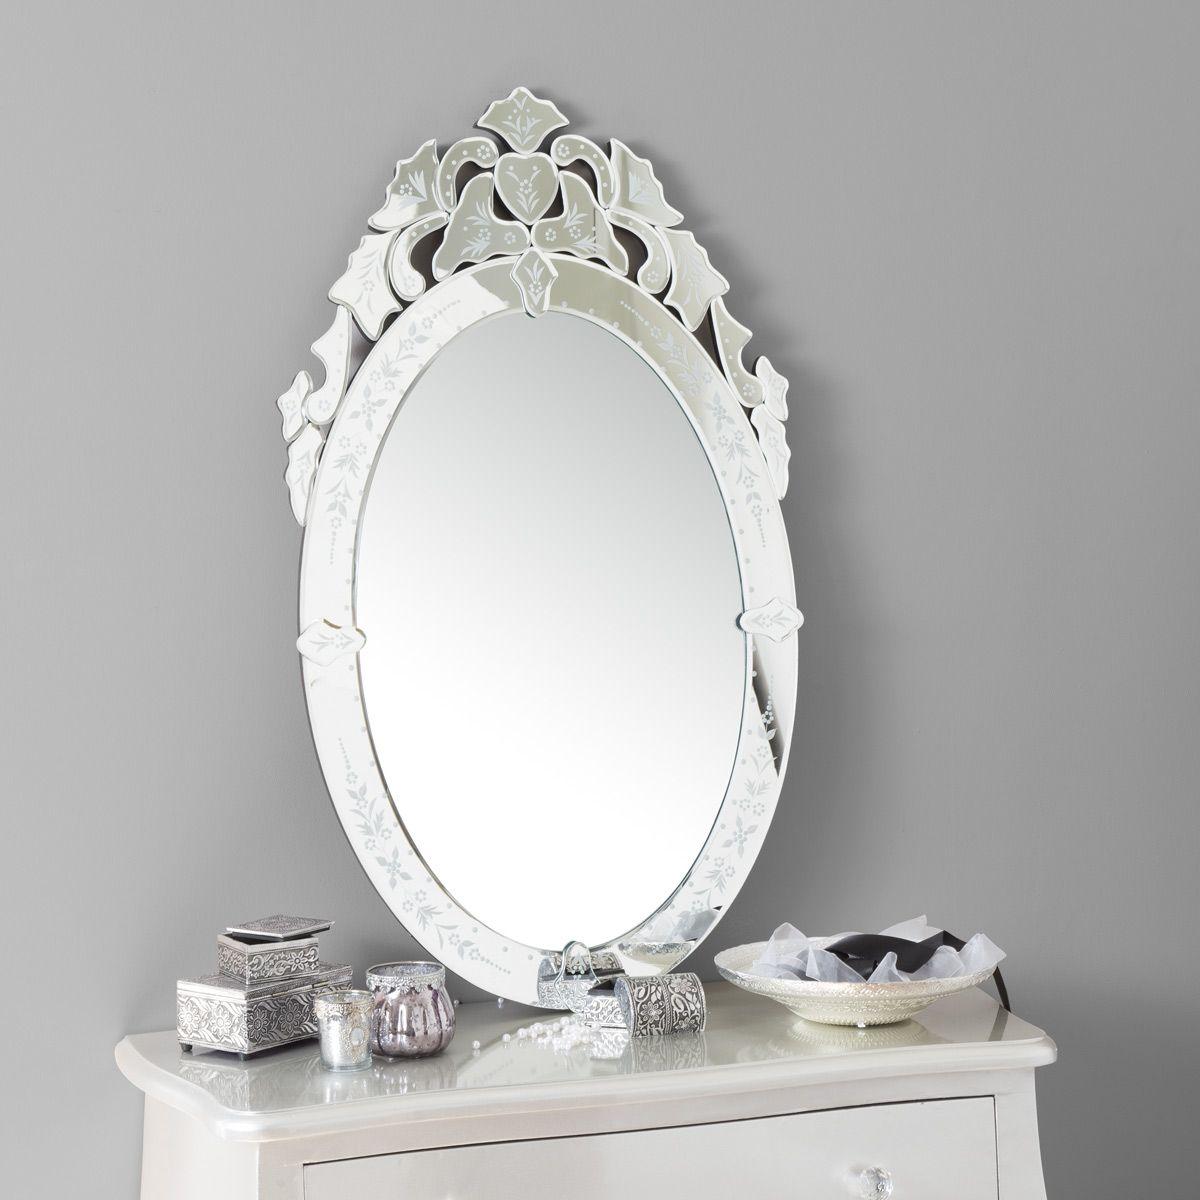 Specchio Veneziano ovale | HOME sweet home. | Pinterest | Mirror